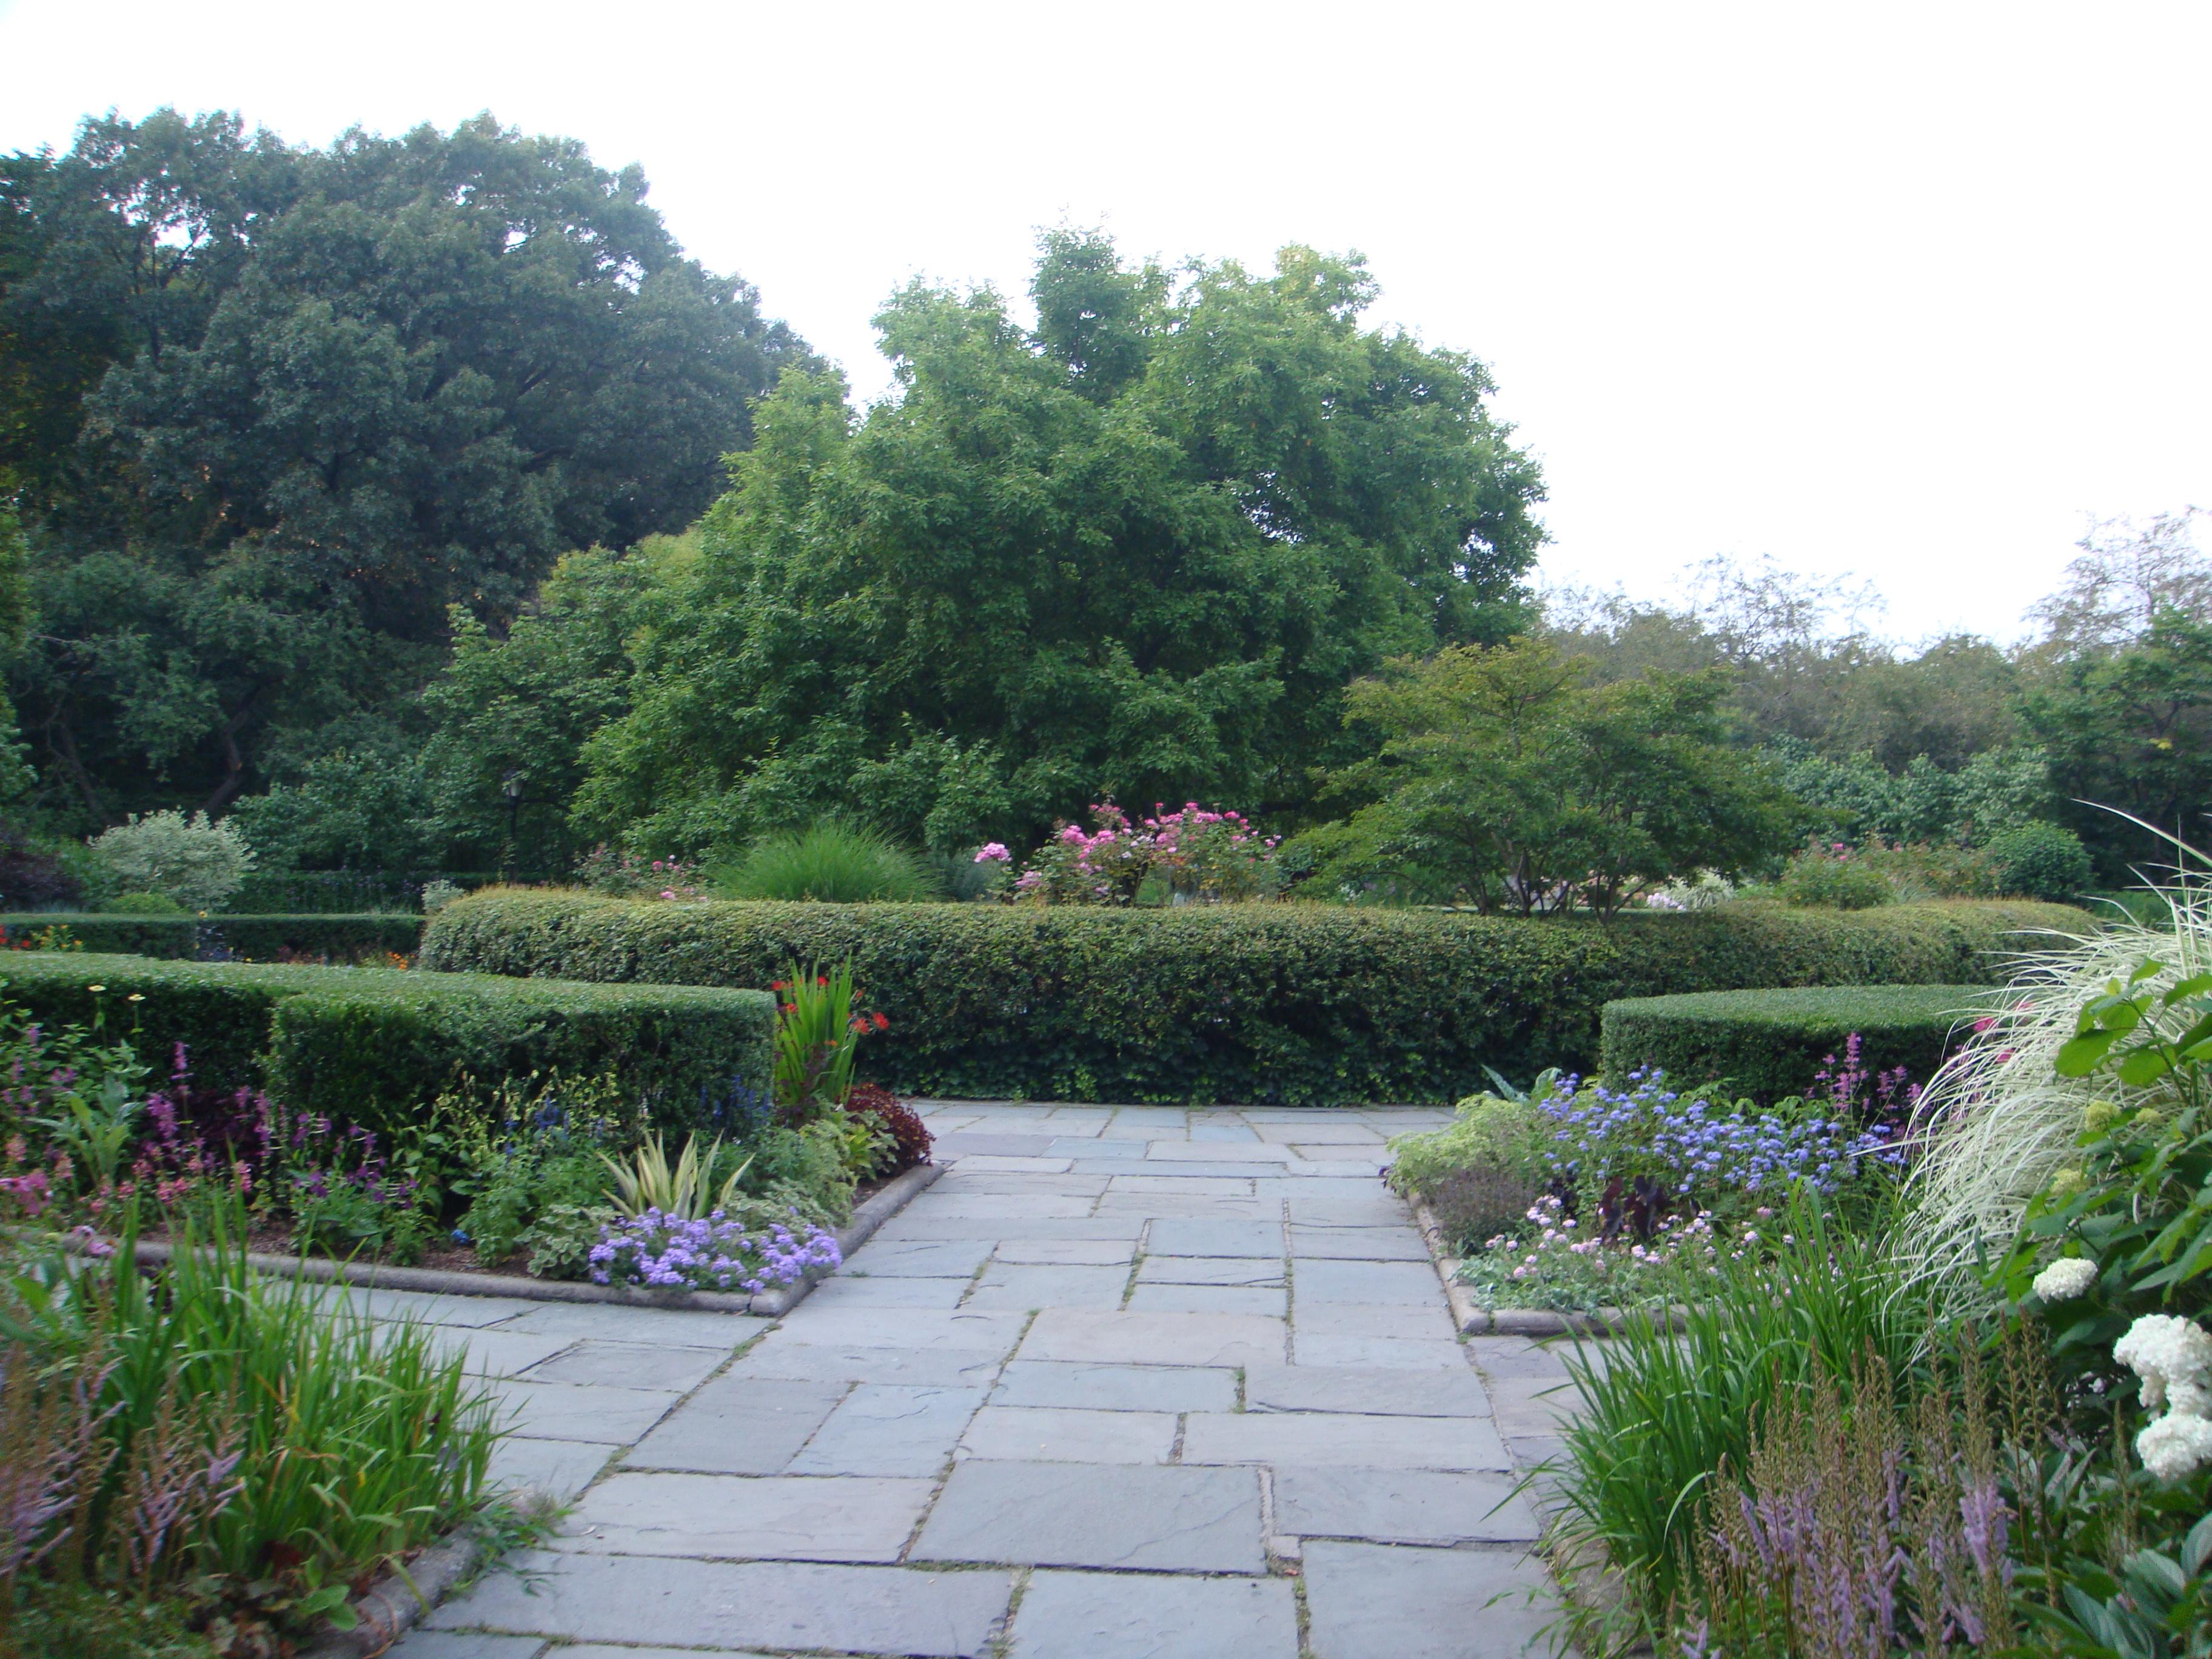 filecentral park conservatory garden panoramiojpg - Central Park Conservatory Garden